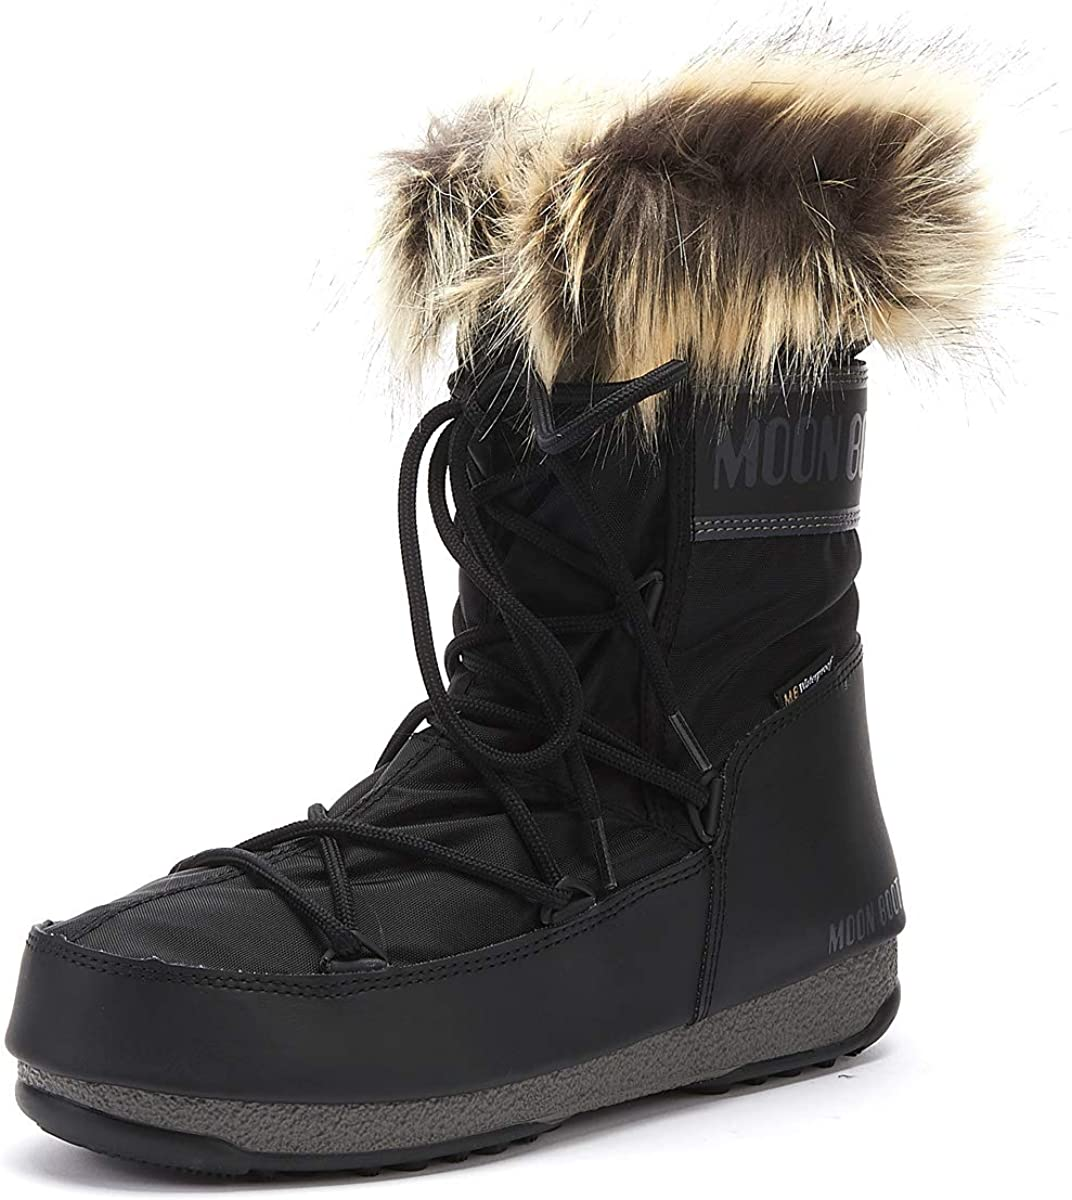 Moon-boot Unisex Adults Snow Boots, Black (Nero 001), 4 UK